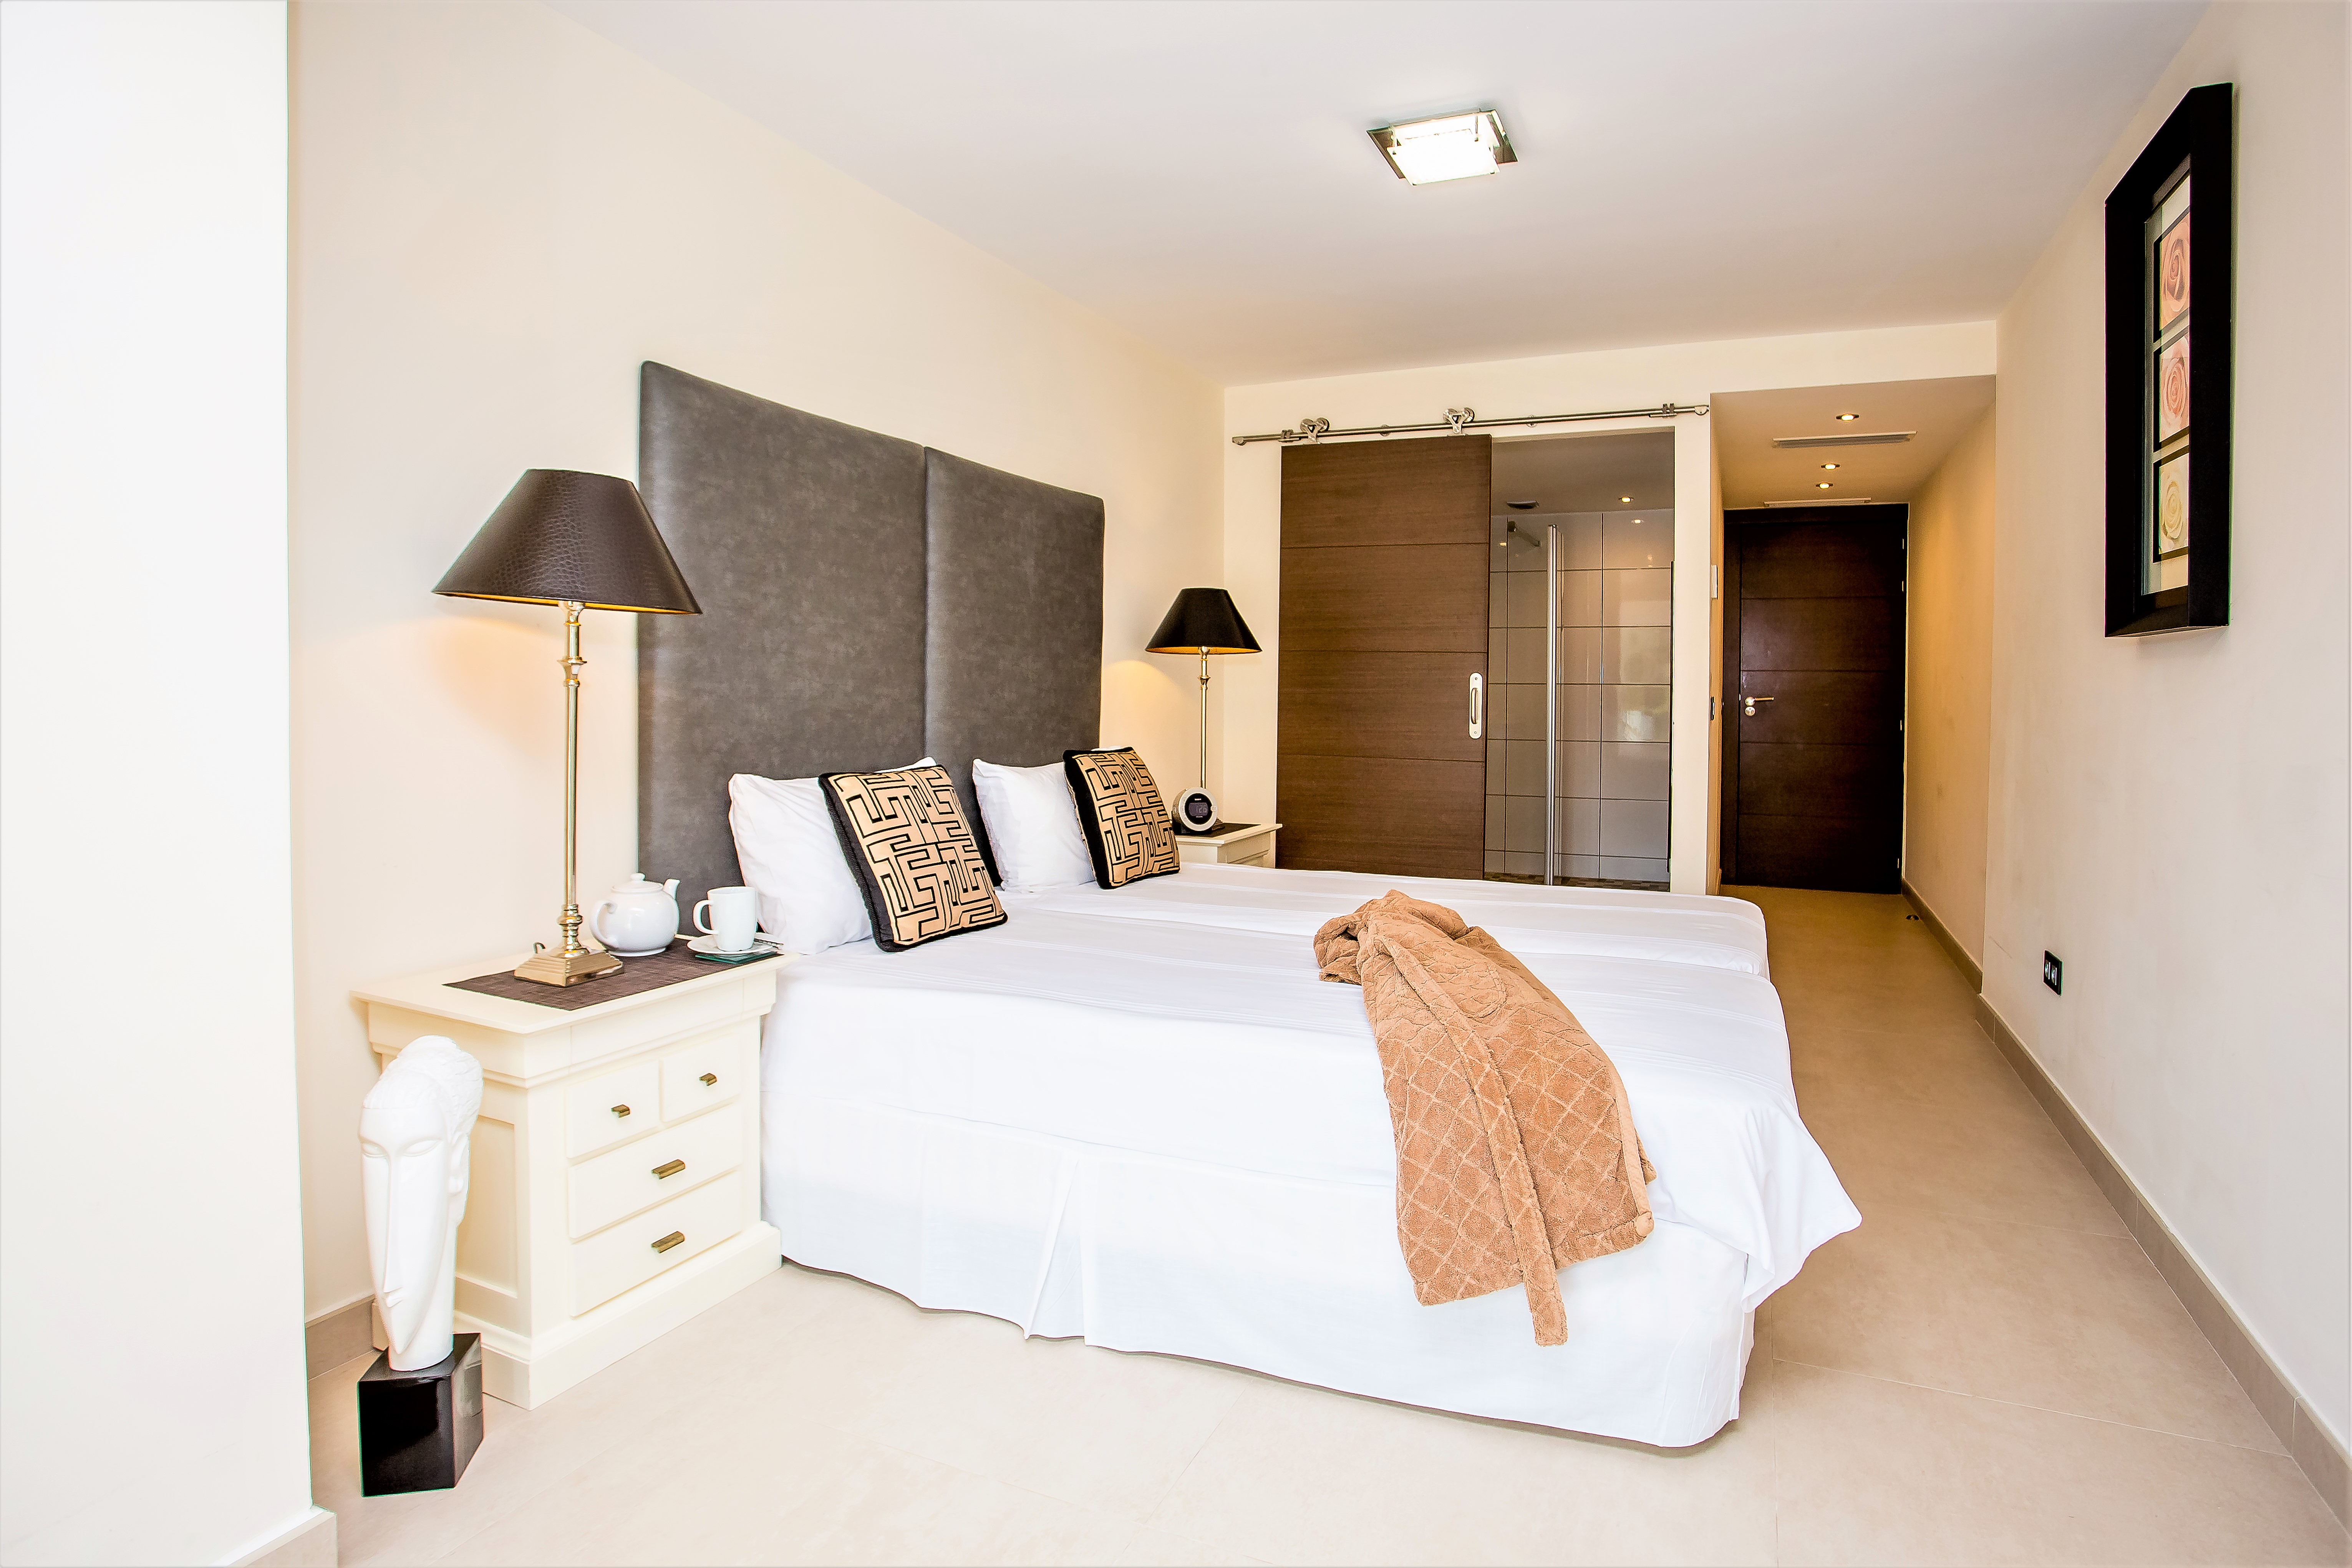 Apartment 8 Bedroom VILLA BY PUERTO BANUS   SEA 5 min                                photo 20203741